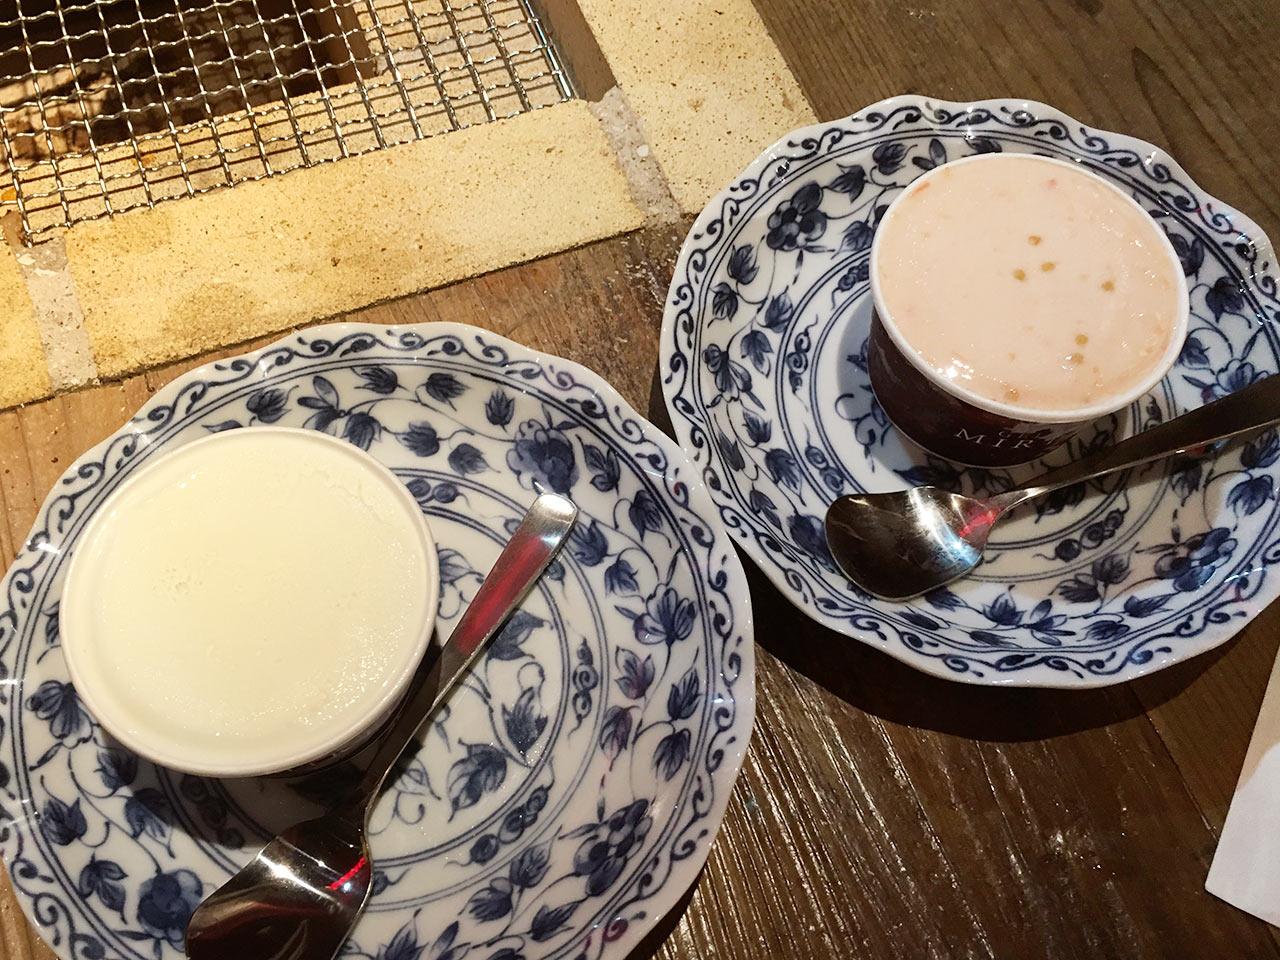 shinbashi-zenibako-bbq-desert02